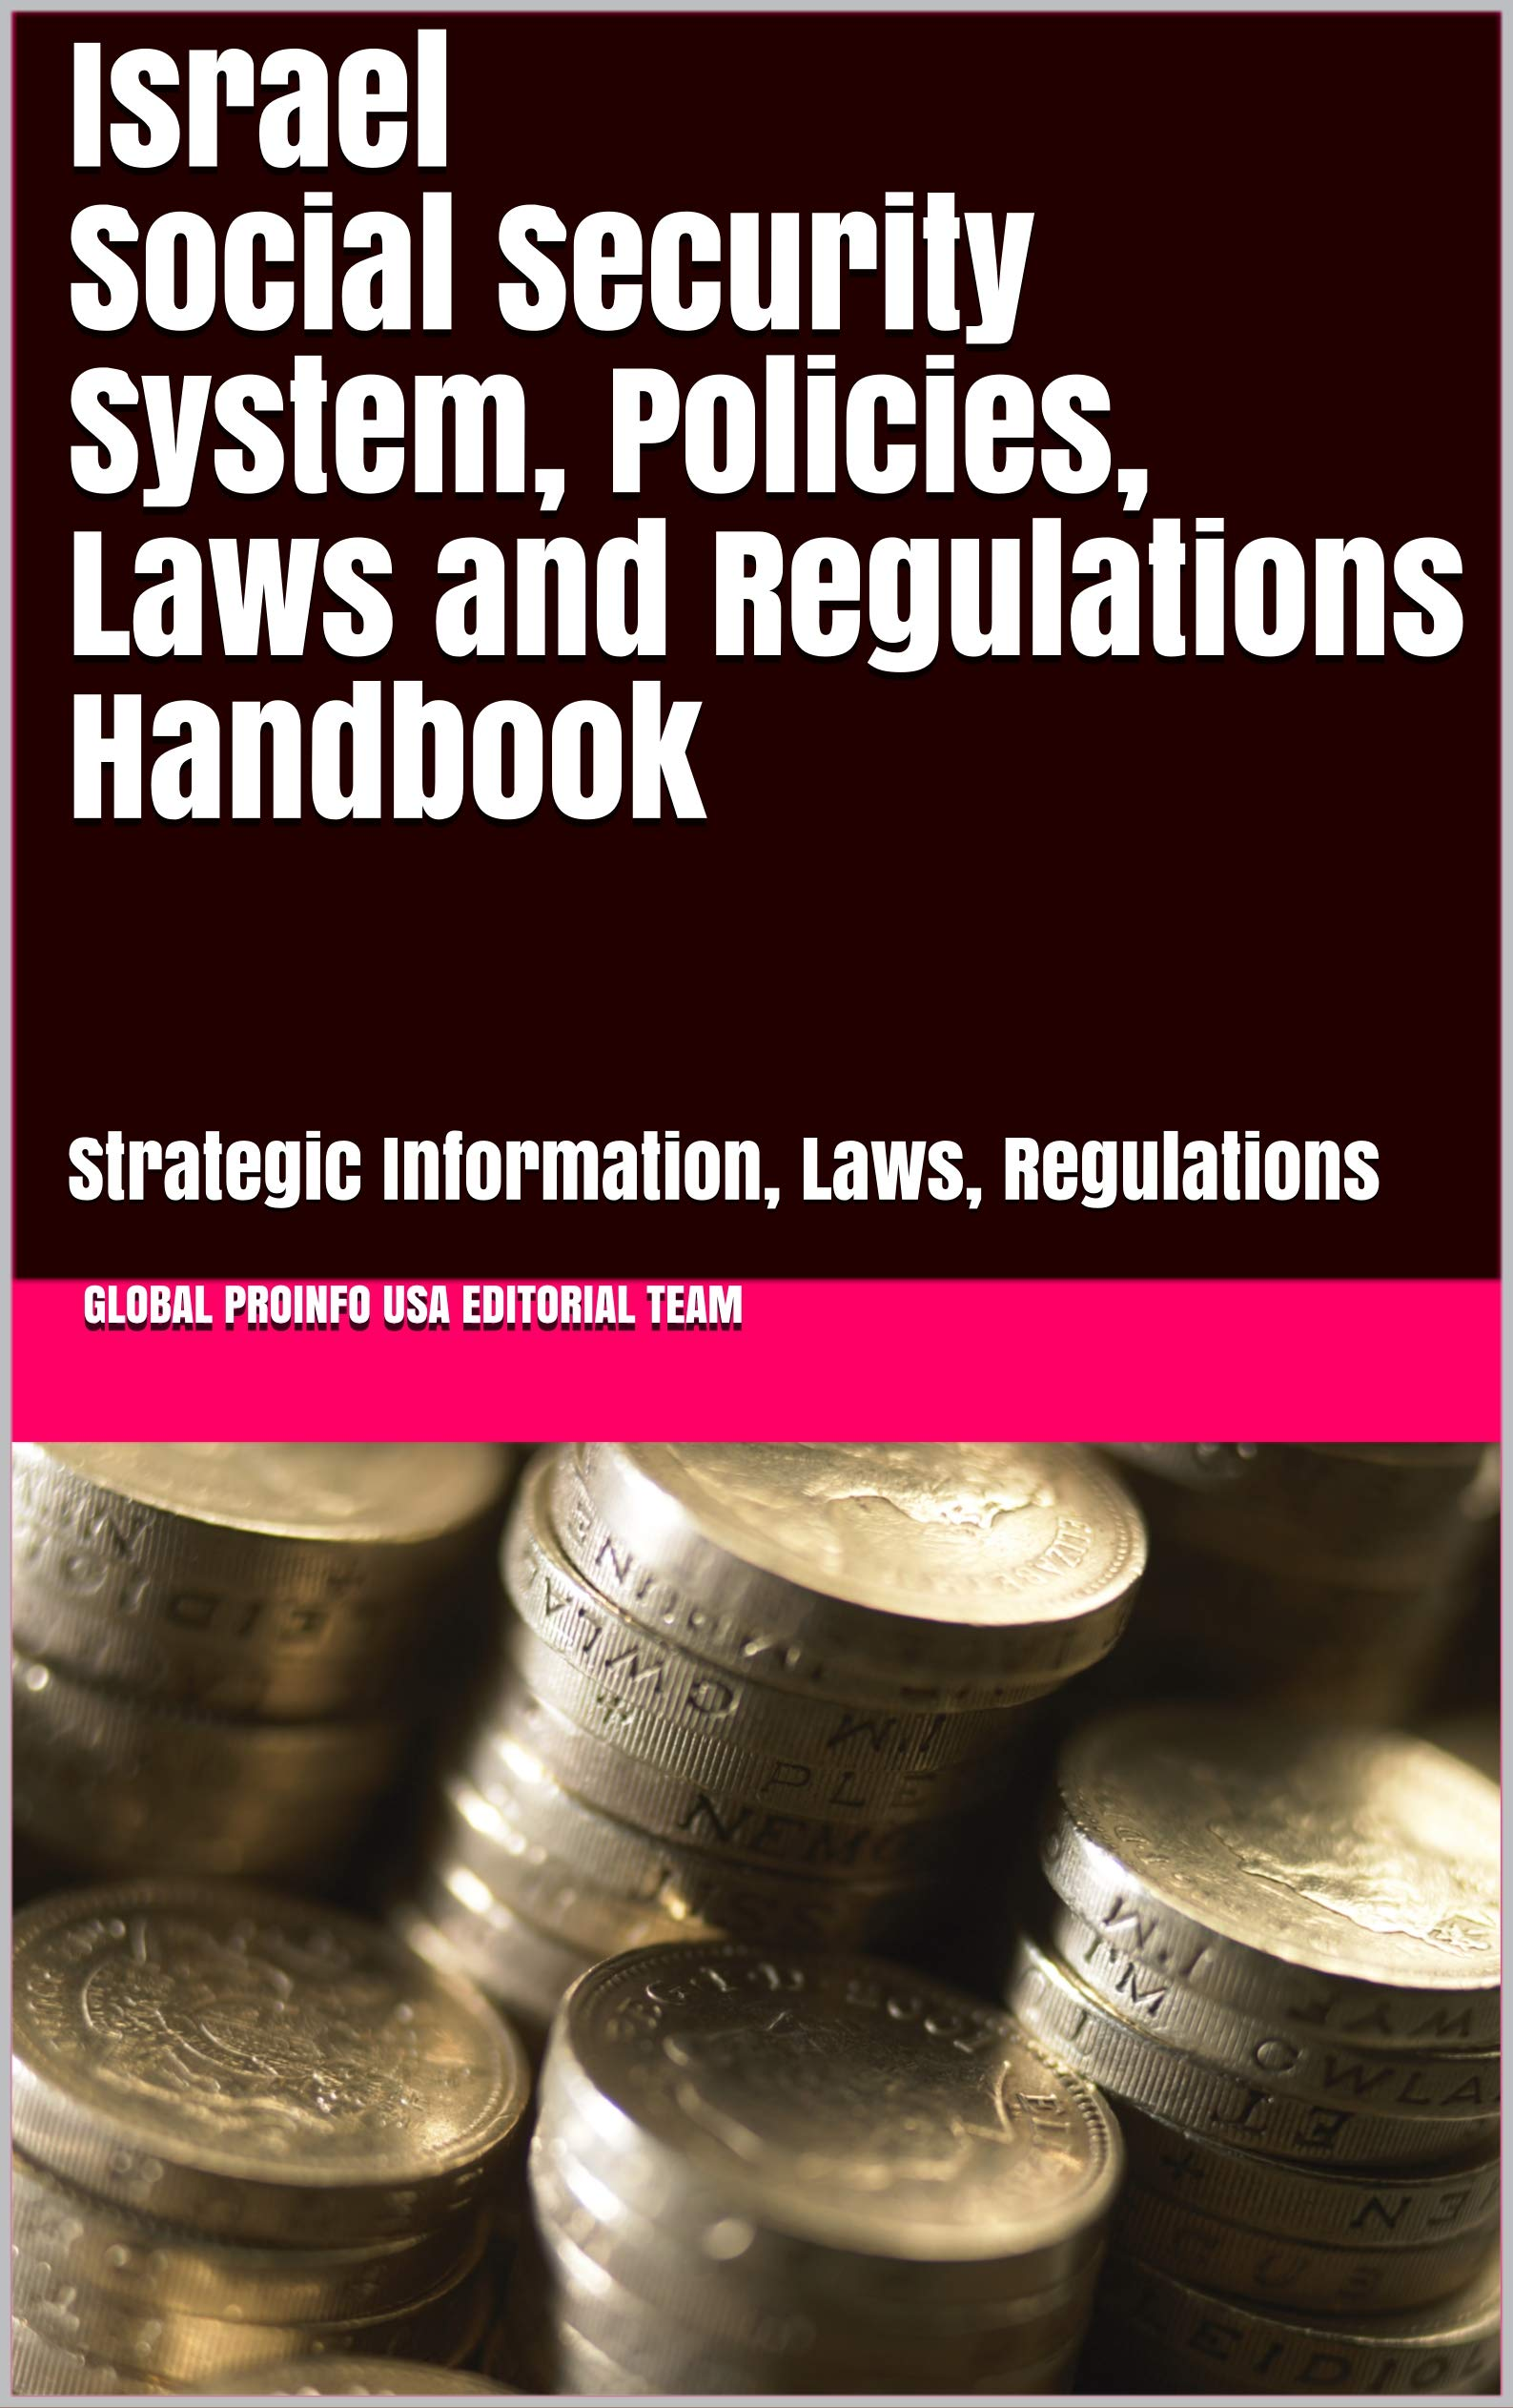 Israel Social Security System, Policies, Laws and Regulations Handbook: Strategic Information, Laws, Regulations (World Social Security Policy Library Book 150)